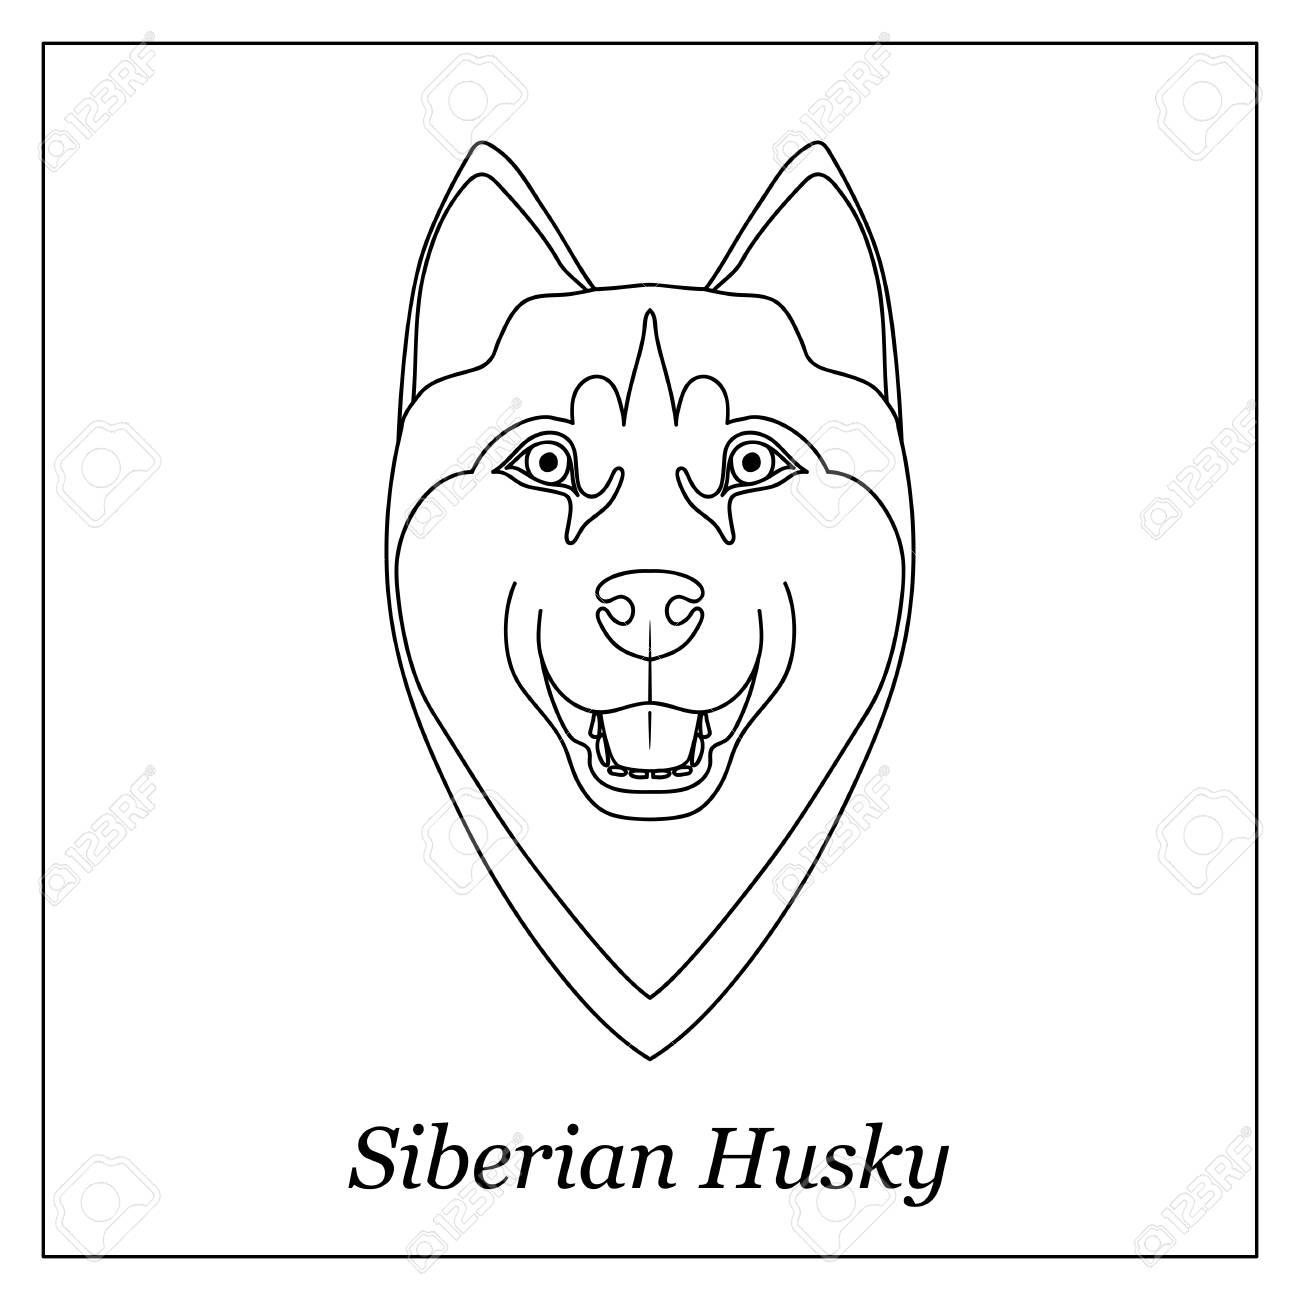 Isolated Black Outline Head Of Siberian Husky On White Background